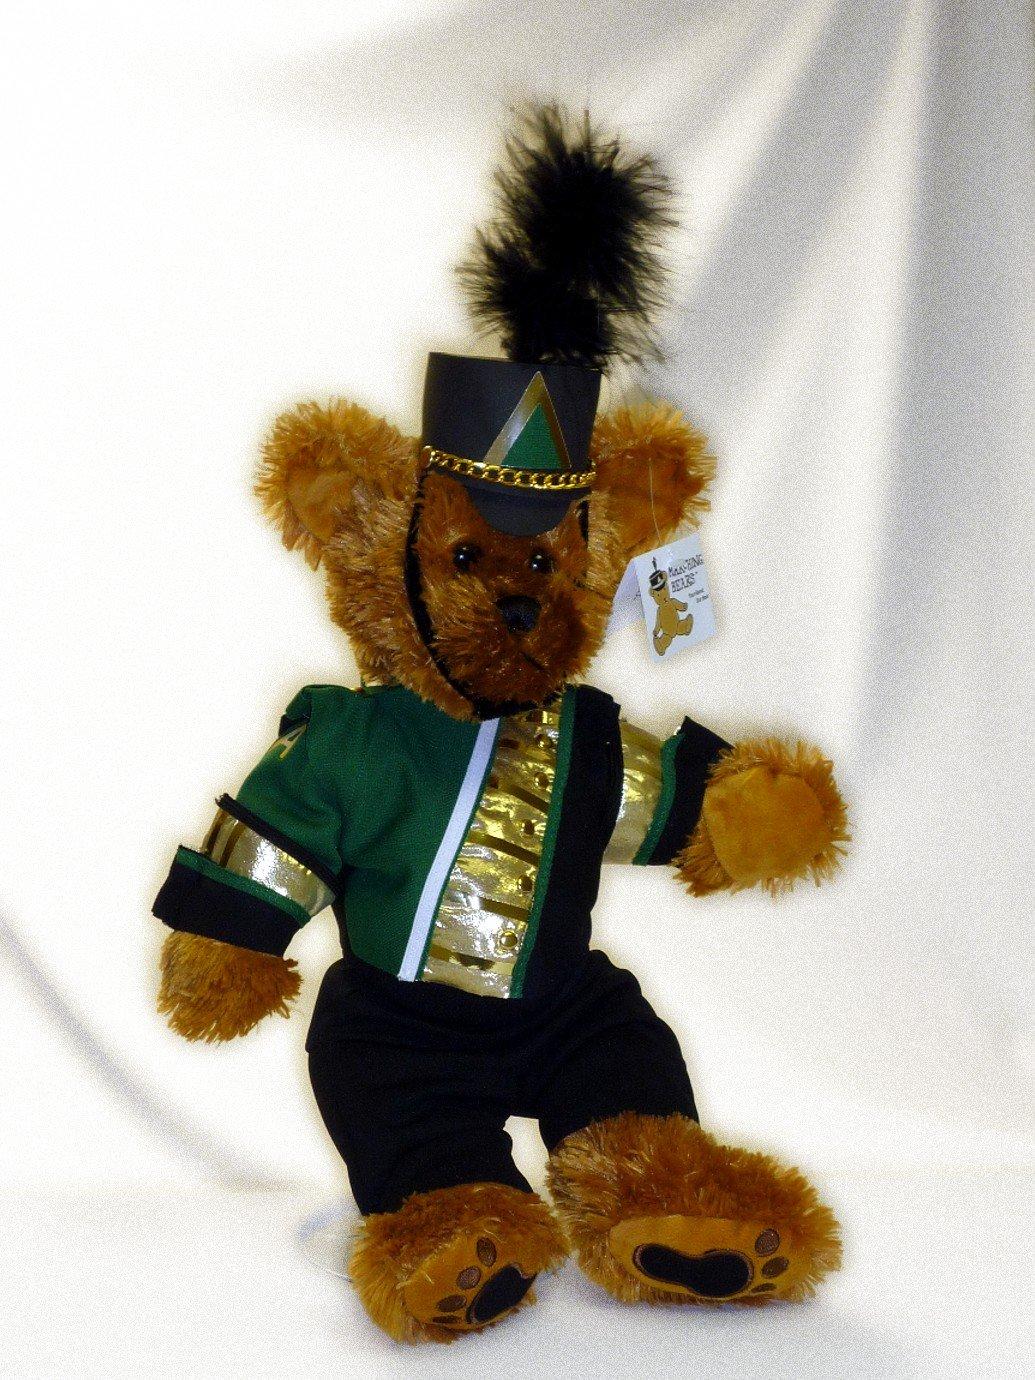 Audubon HS Marching Band Uniform Teddy Bear